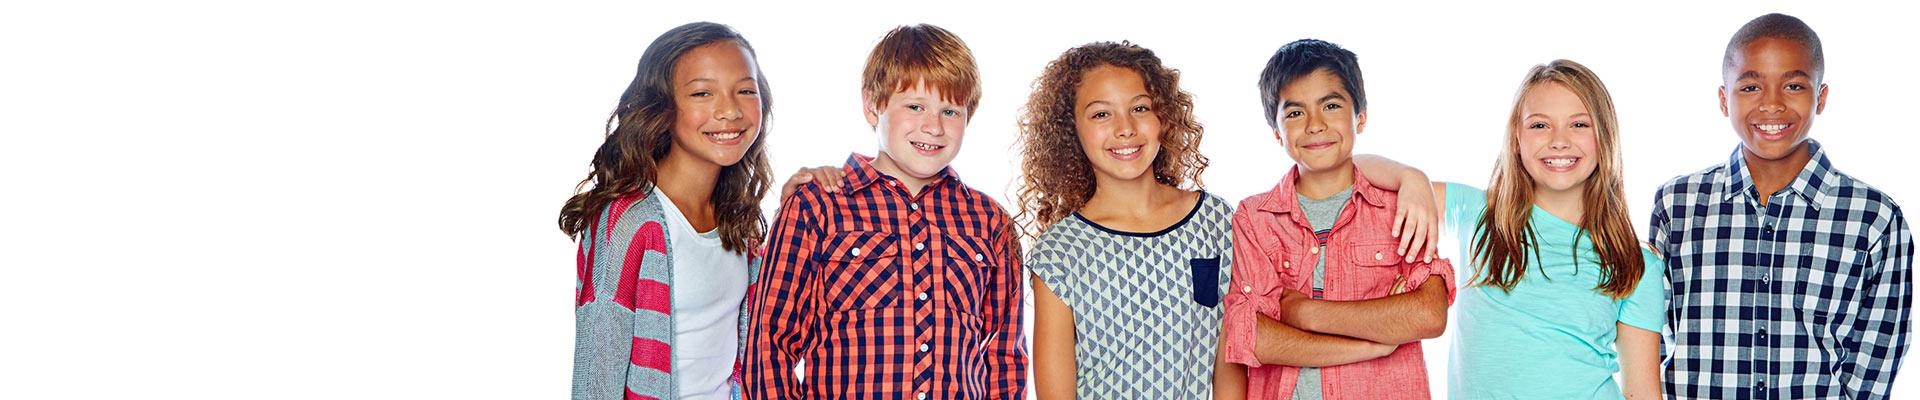 Children Smiling Smiles For Maine Orthodontics Waterville, Skowhegan, Dover-Foxcroft, & Lewiston-Auburn, ME